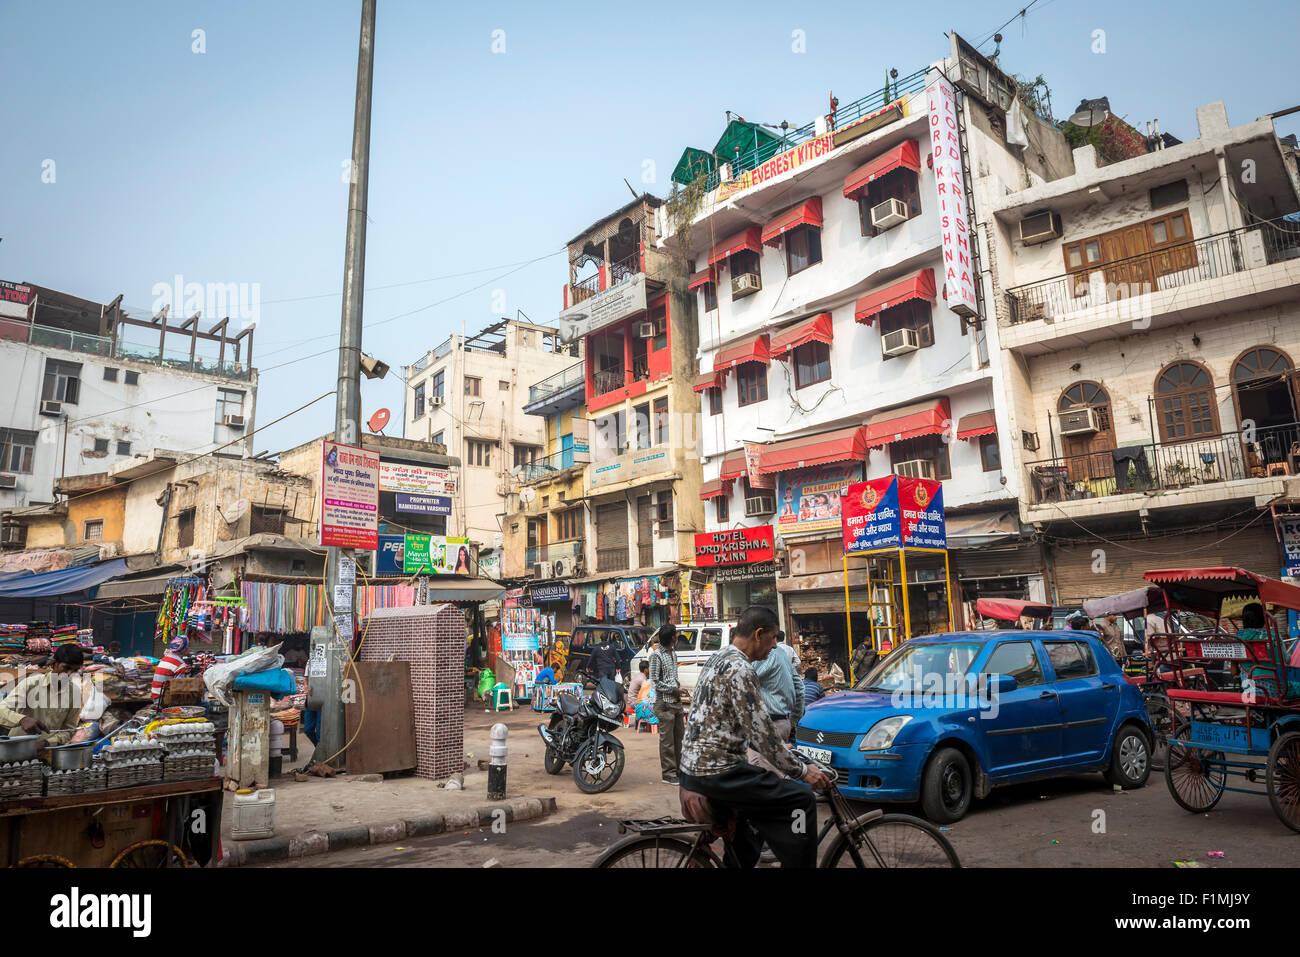 Busy street market near Main Bazaar in the Paharganj District of New Delhi, India - Stock Image